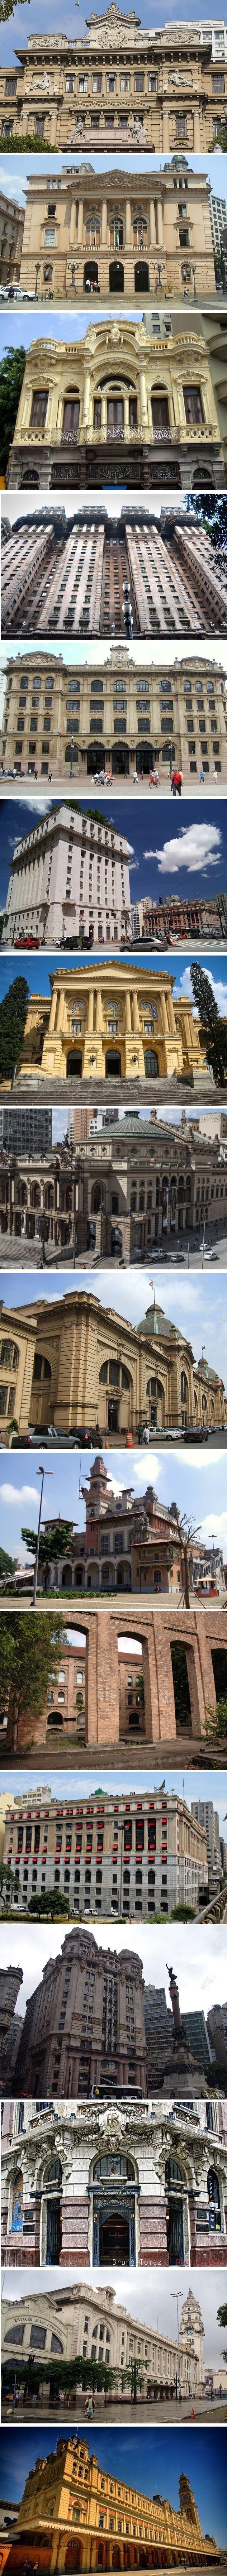 Historic Buildings of São Paulo, Brazil / Prédios Históricos de São Paulo, Brasil